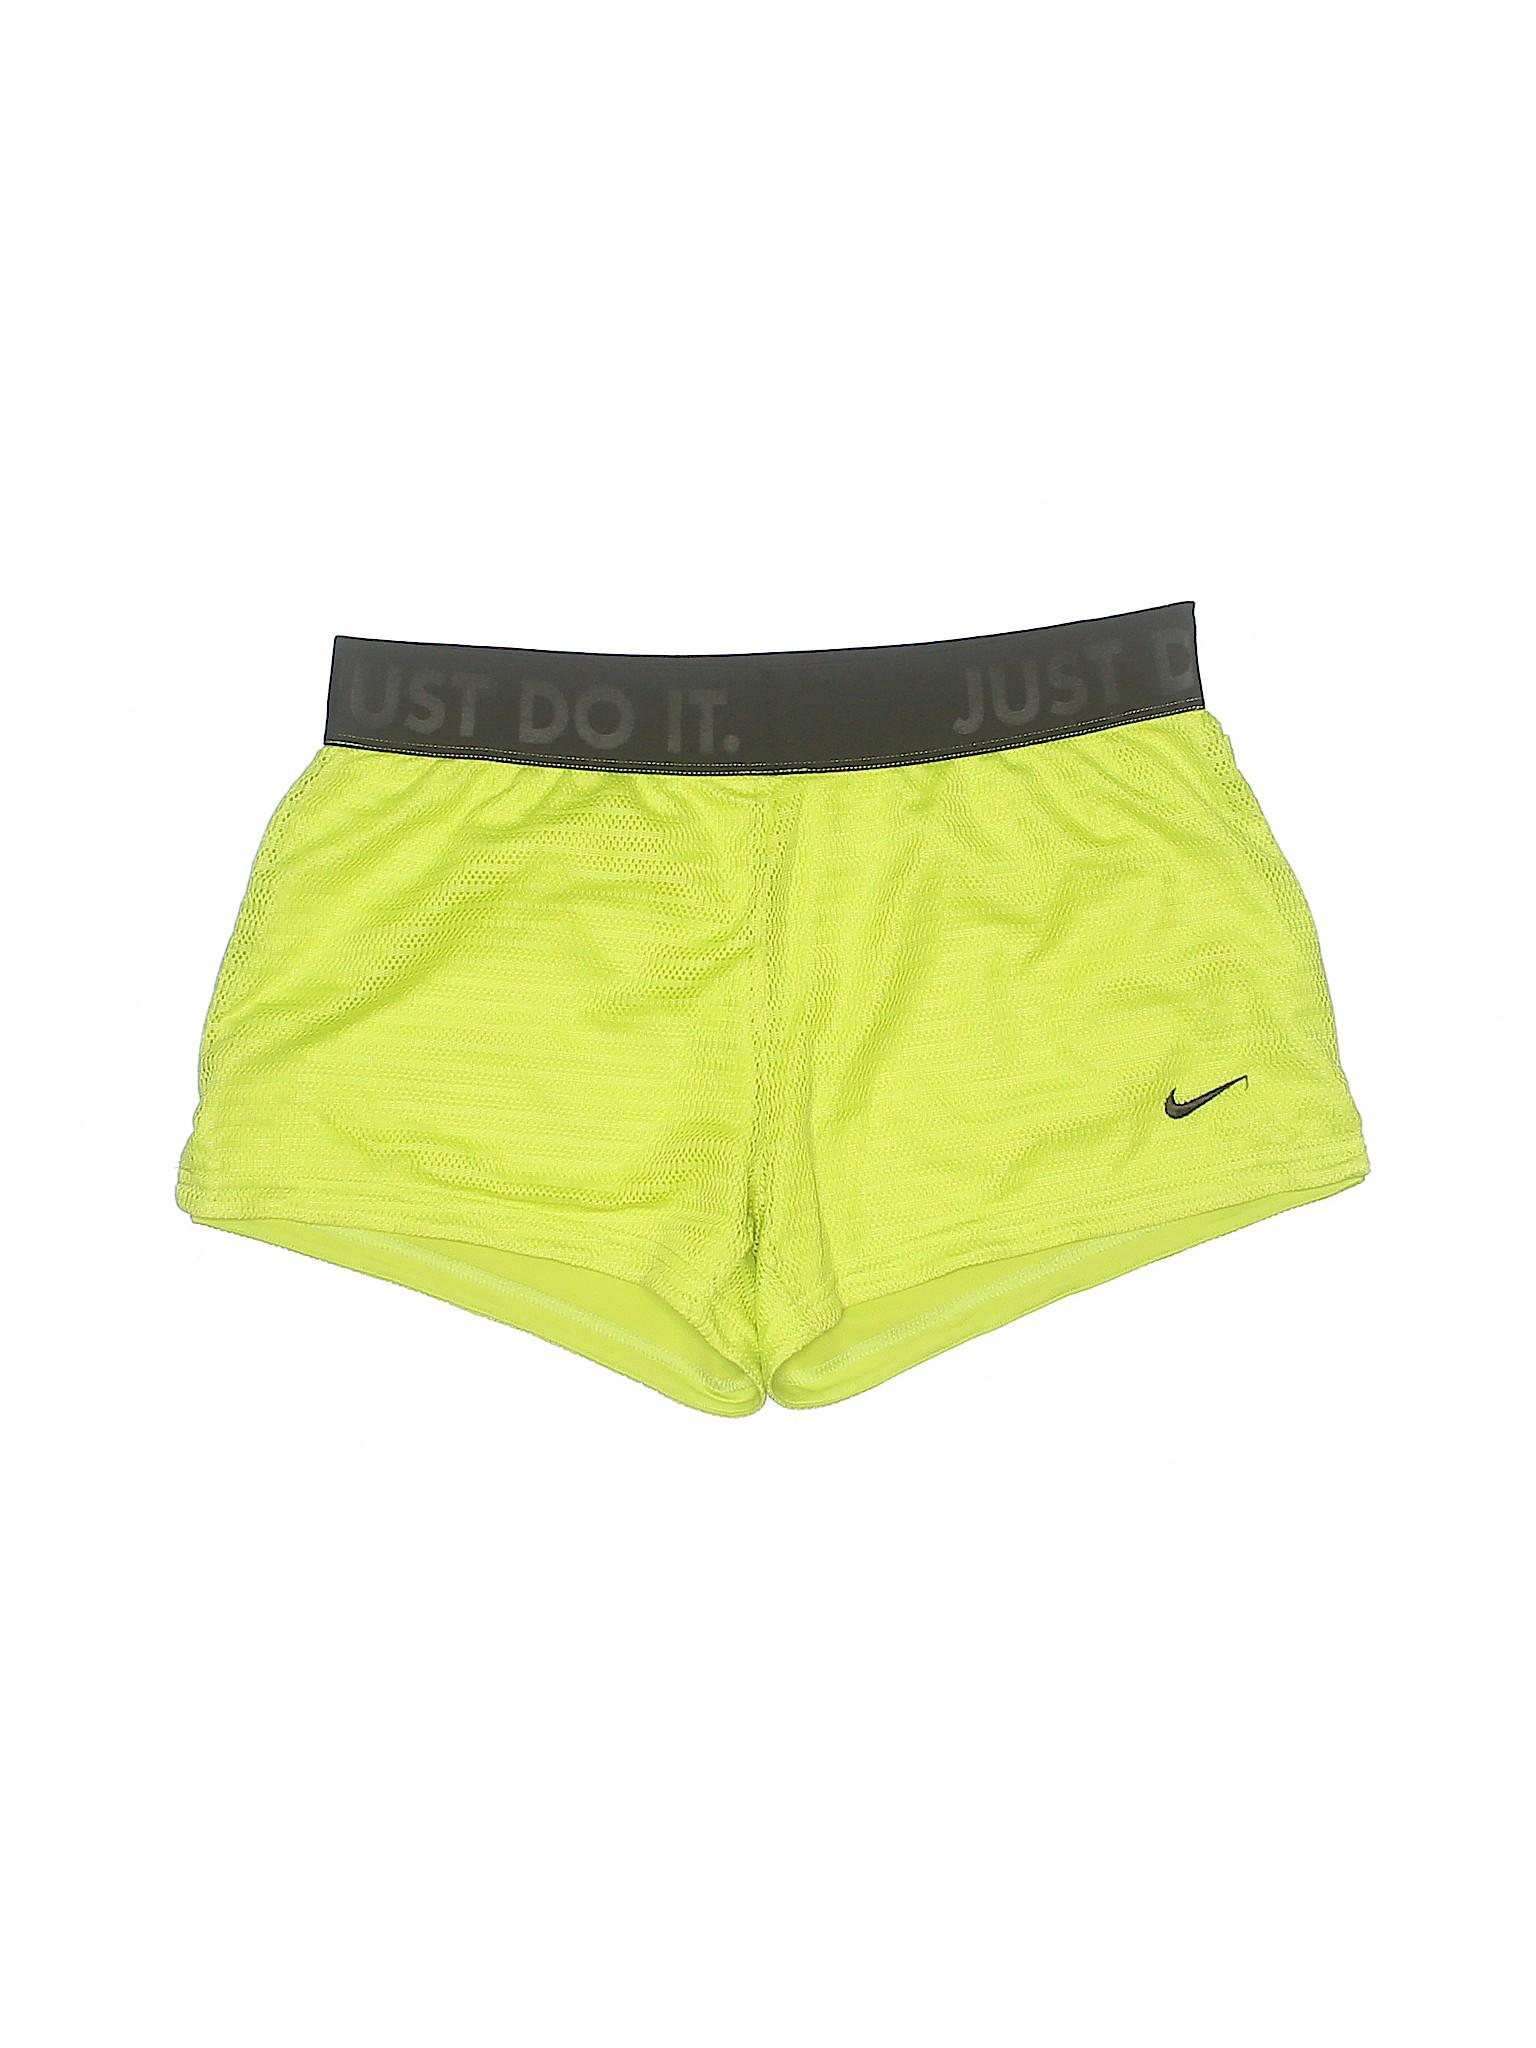 Nike Athletic Leisure Shorts winter Leisure winter zFOqHwn